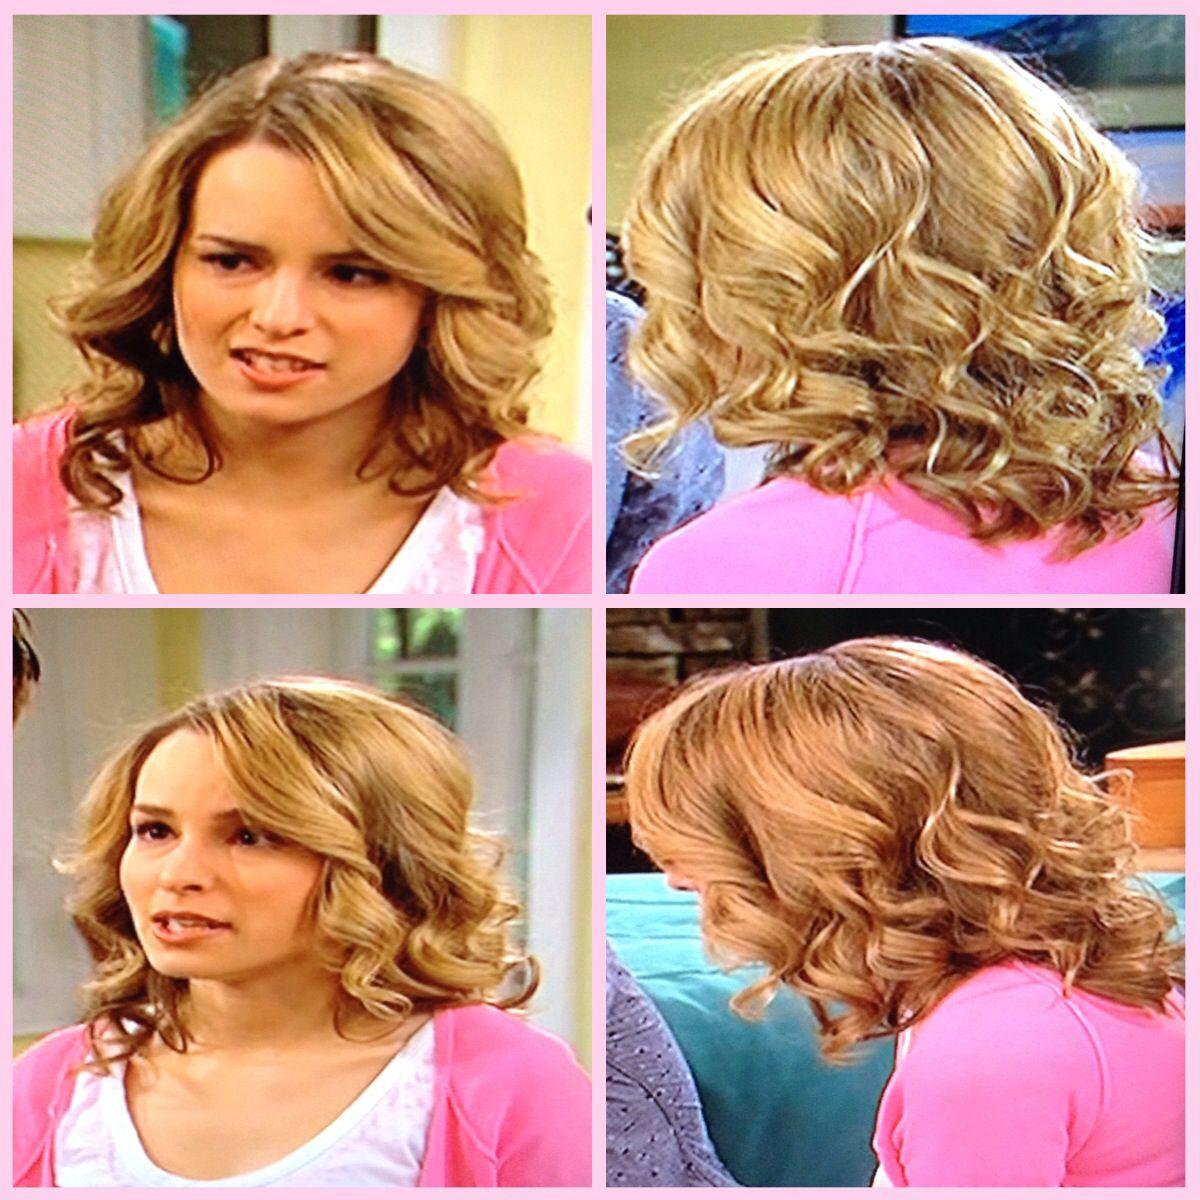 Pin By Lauren Alexis On Hair Insperations Big Barrel Curls Barrel Curls Short Hair Styles